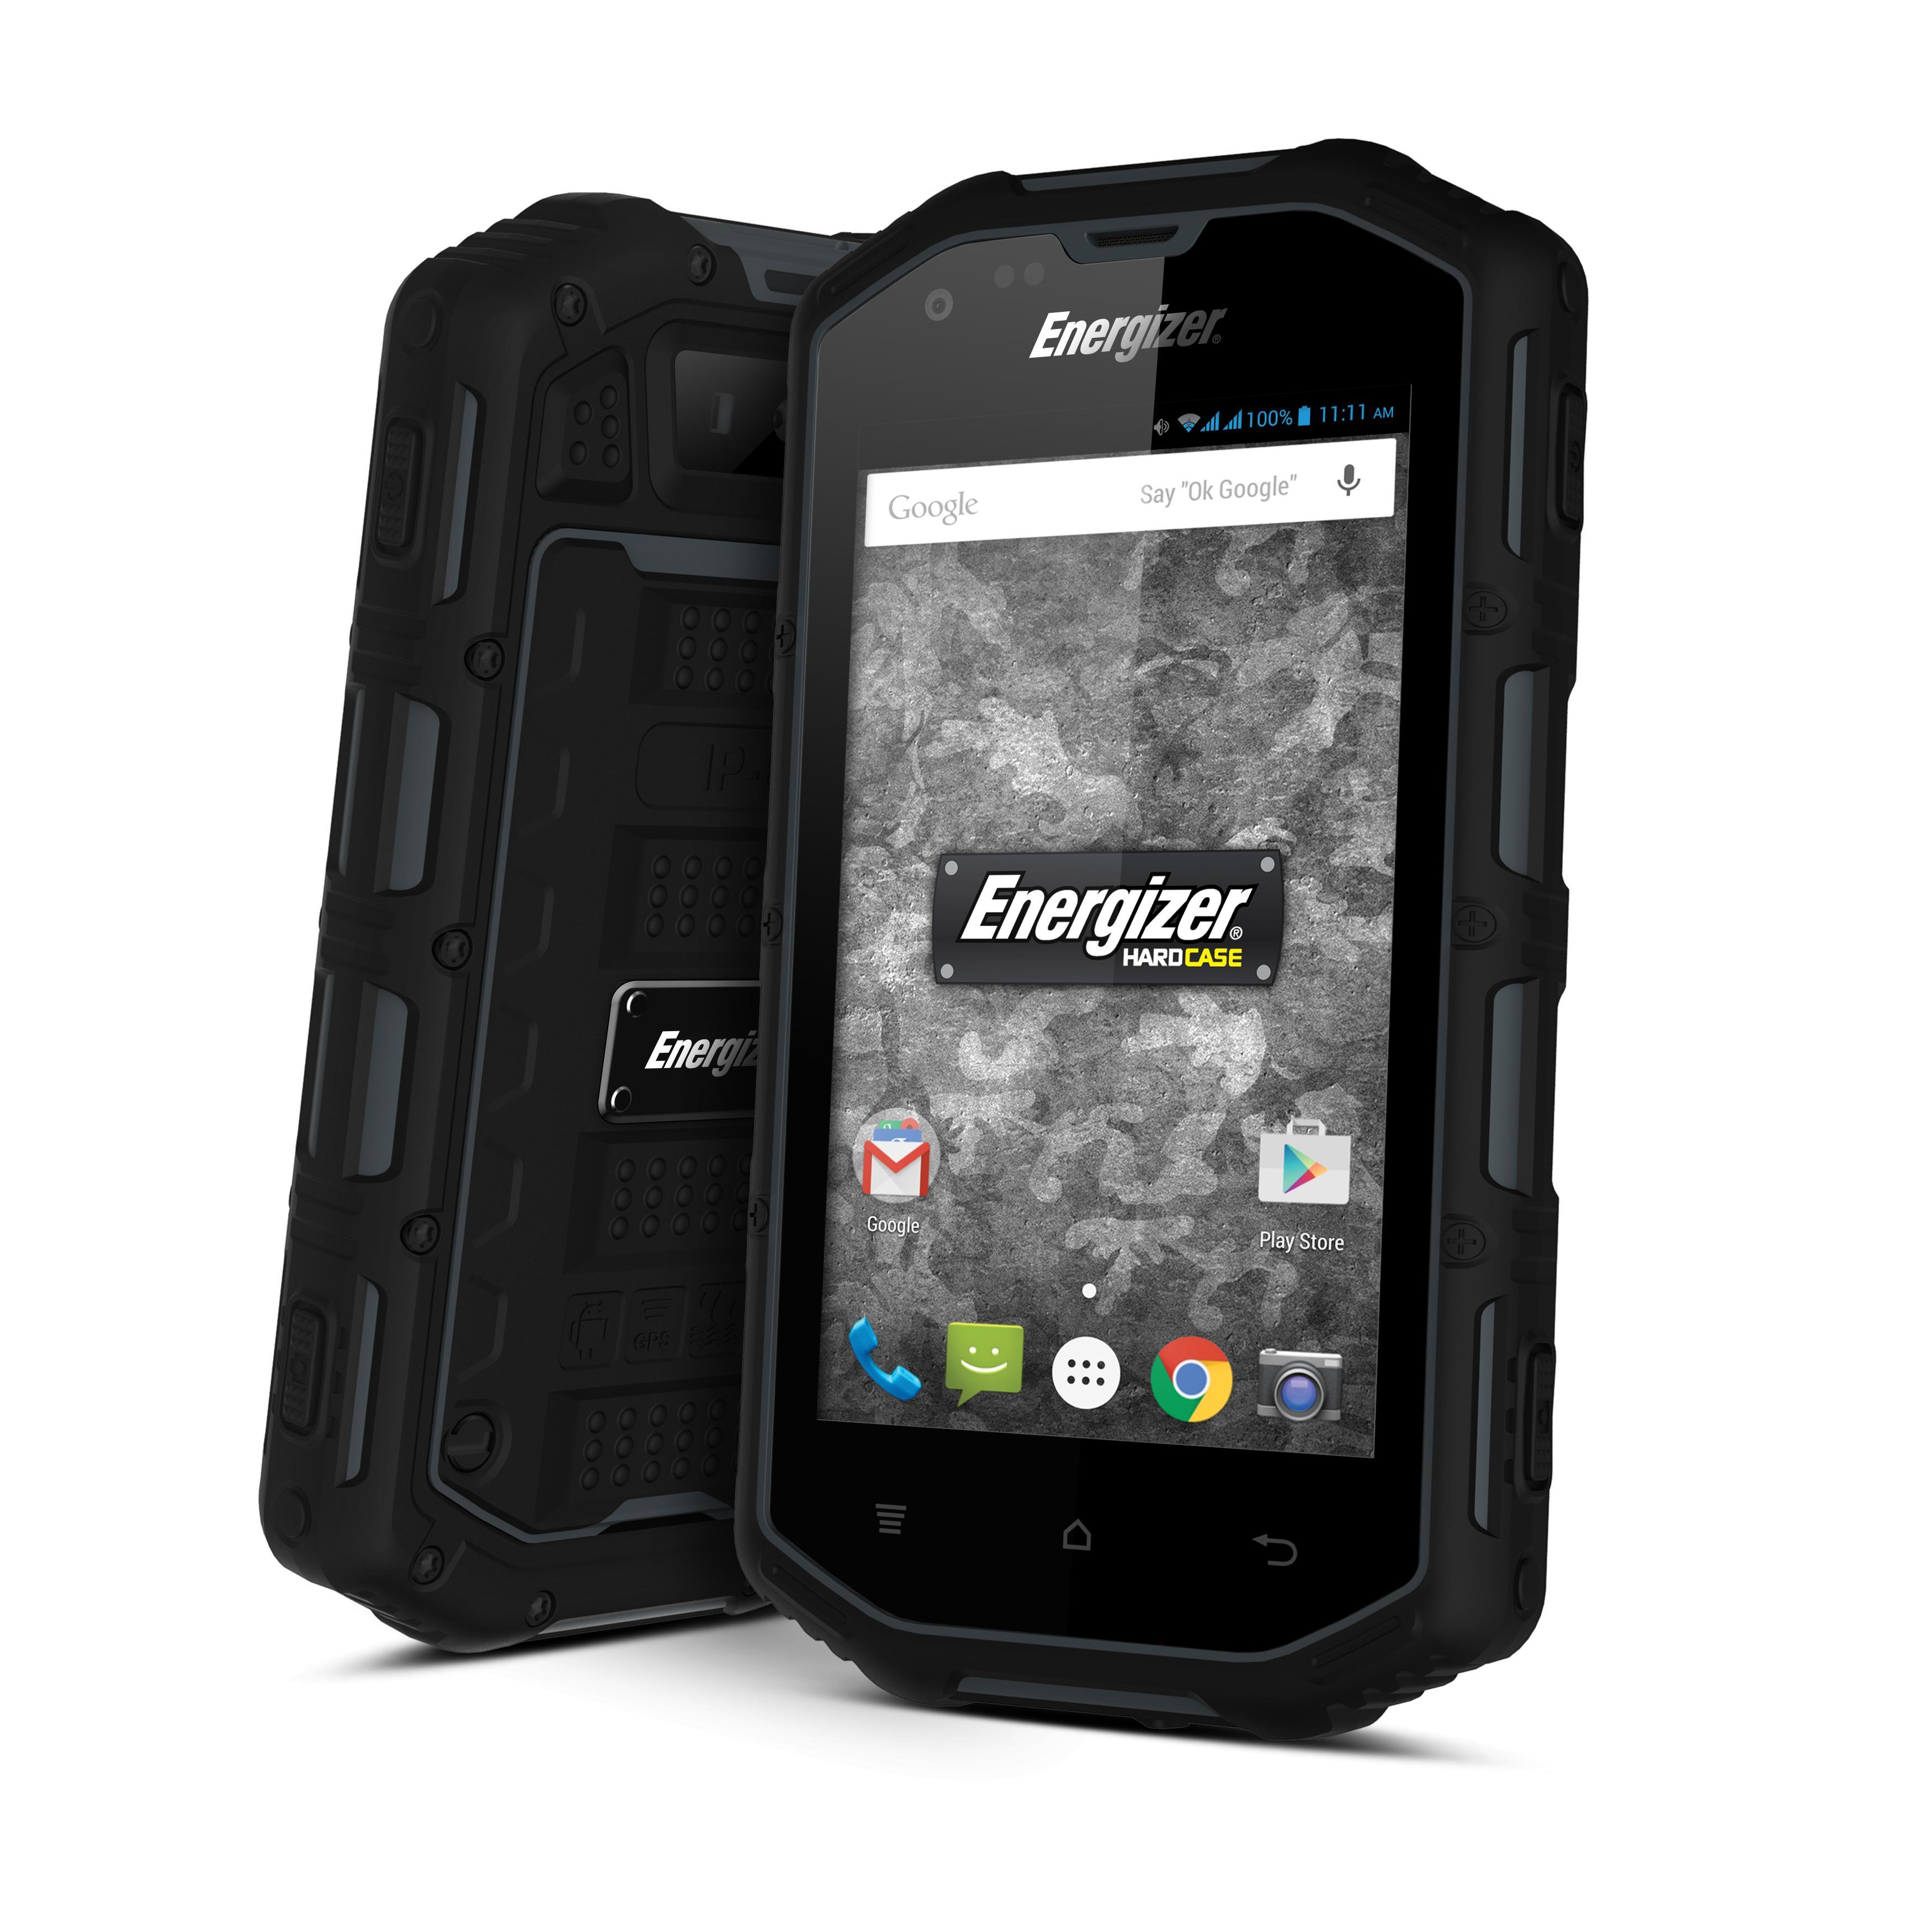 "Smartphone 4"" Durci Energy 400 (Dual Core A7 1.3 GHz, RAM 512 Mo, ROM 4 Go)"